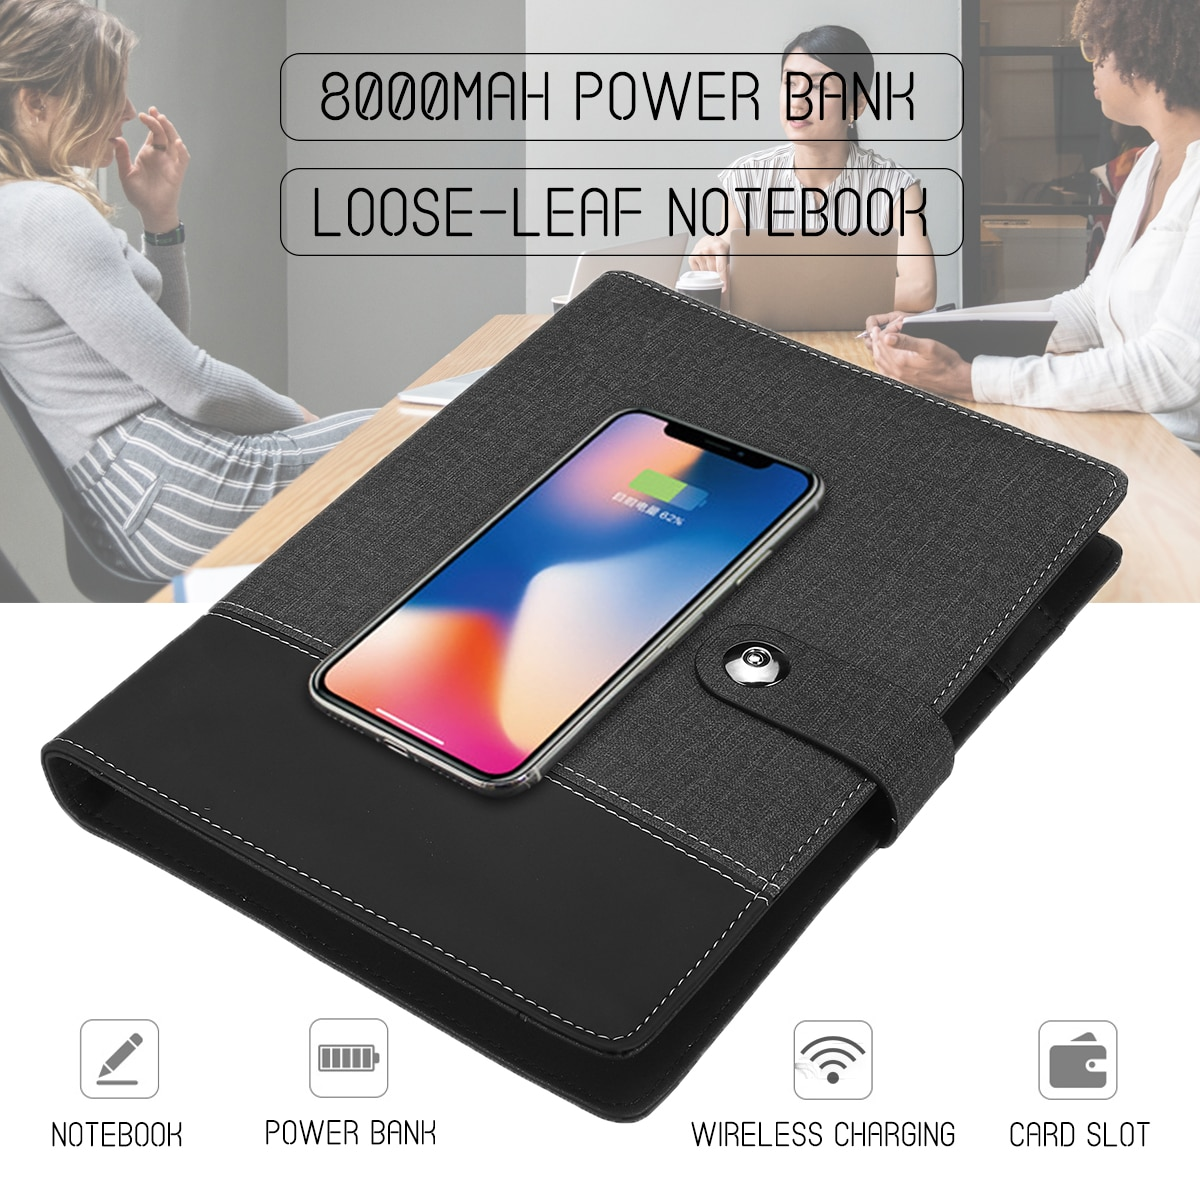 Cuaderno multifuncional con batería externa de 6000 mAh Qi cuaderno de notas de carga inalámbrica carpeta con espiral planificador diario cuaderno de notas de negocios